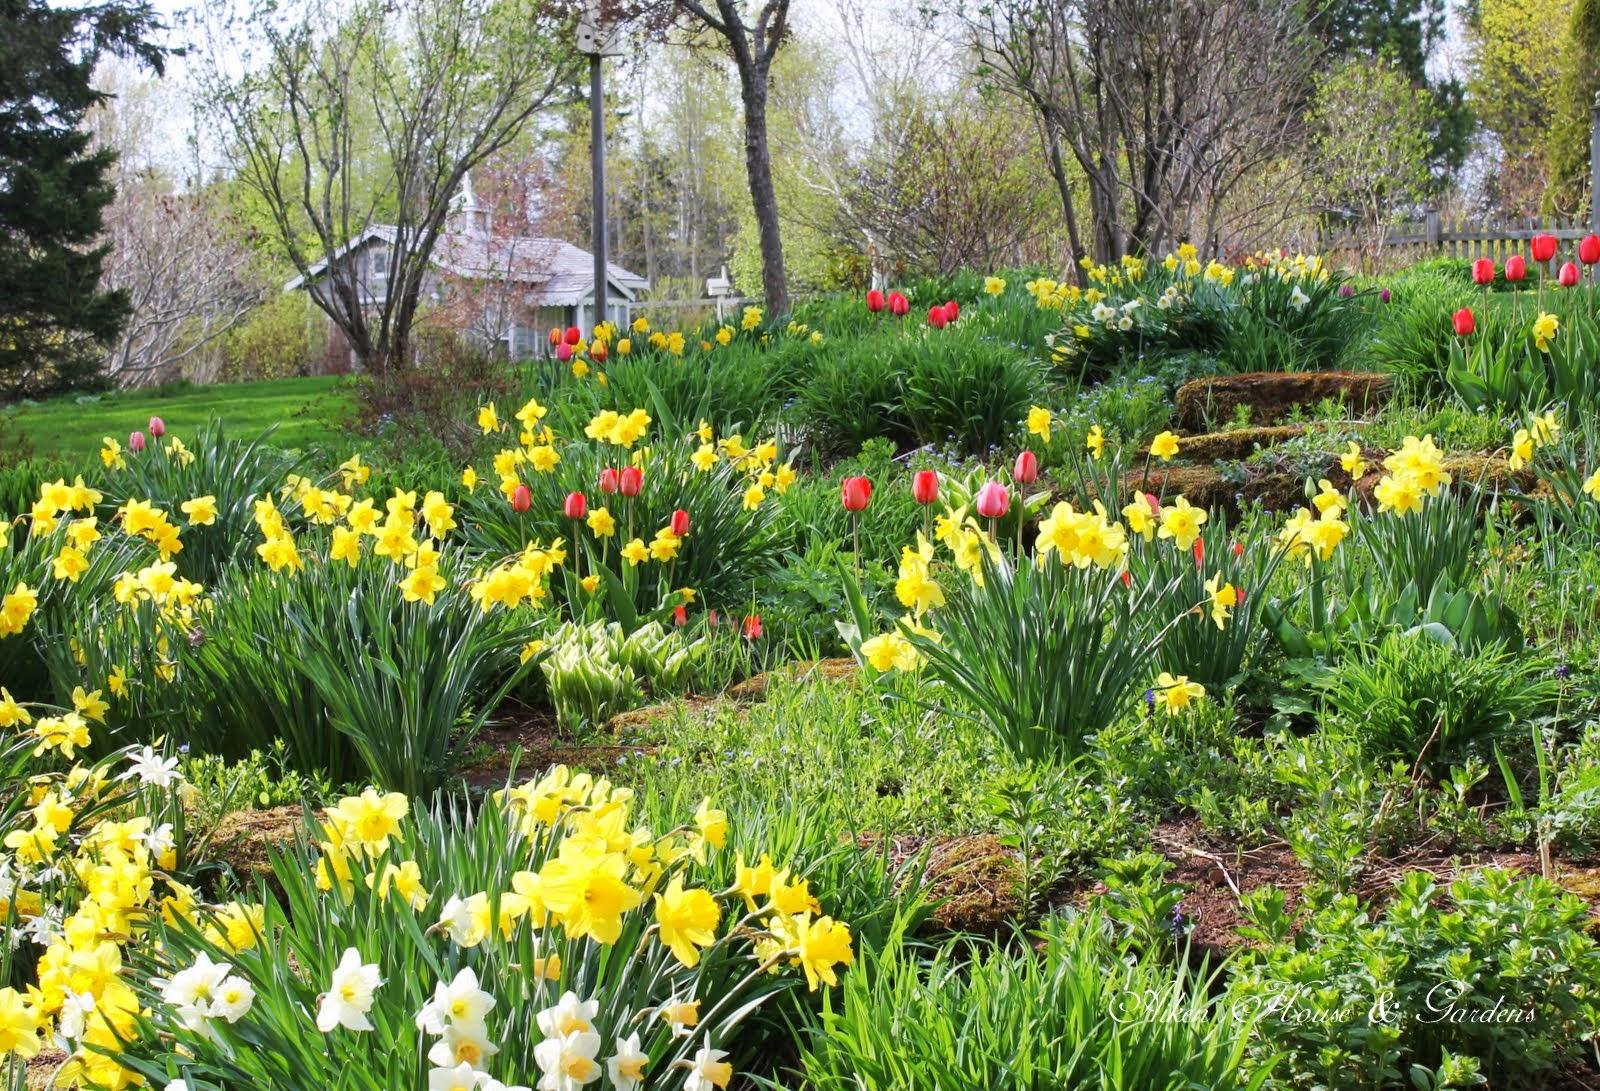 Aiken House Amp Gardens The Winners And Our Spring Garden